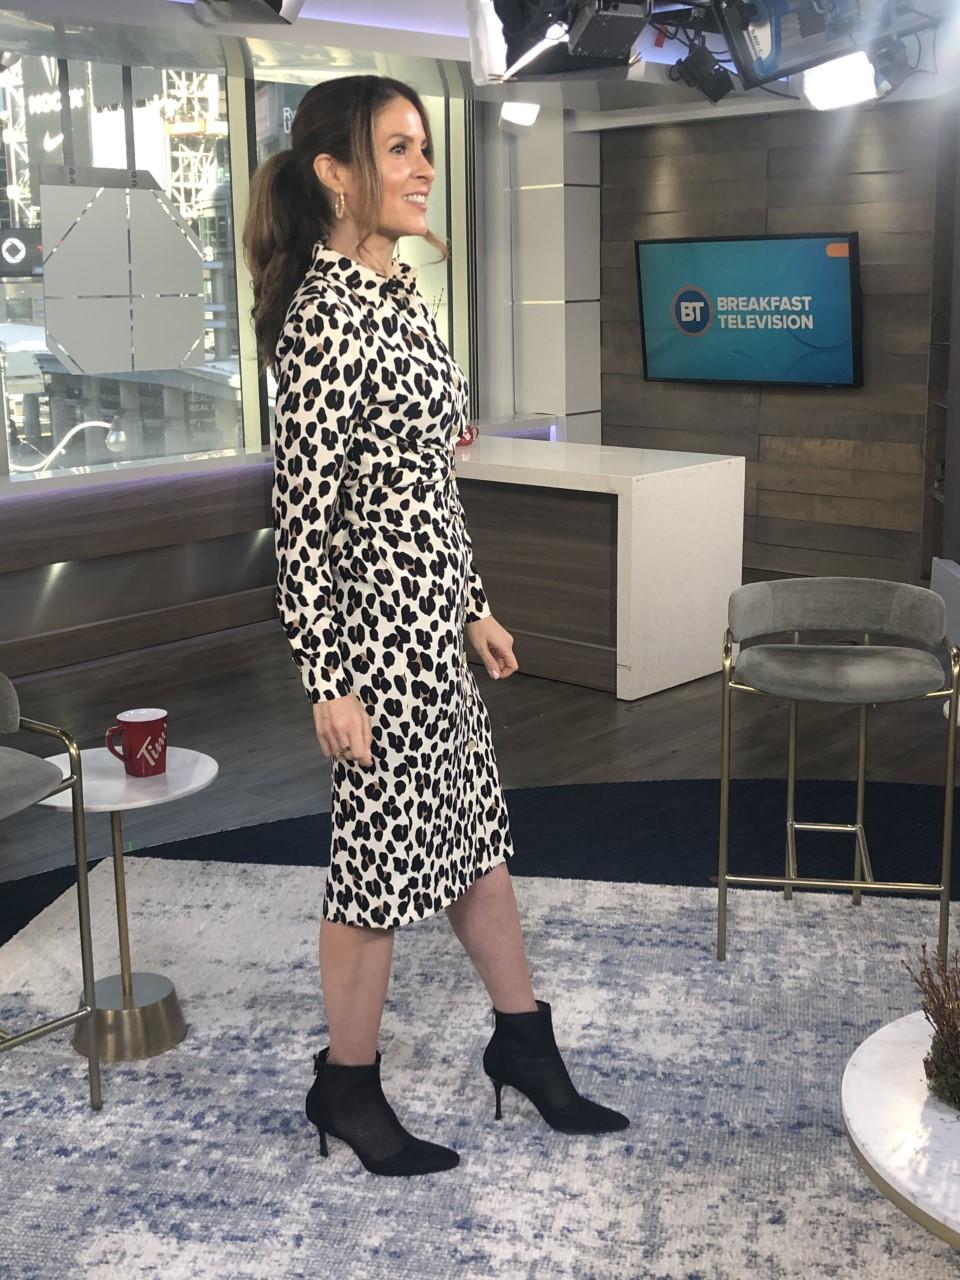 Animal printed dress with black booties